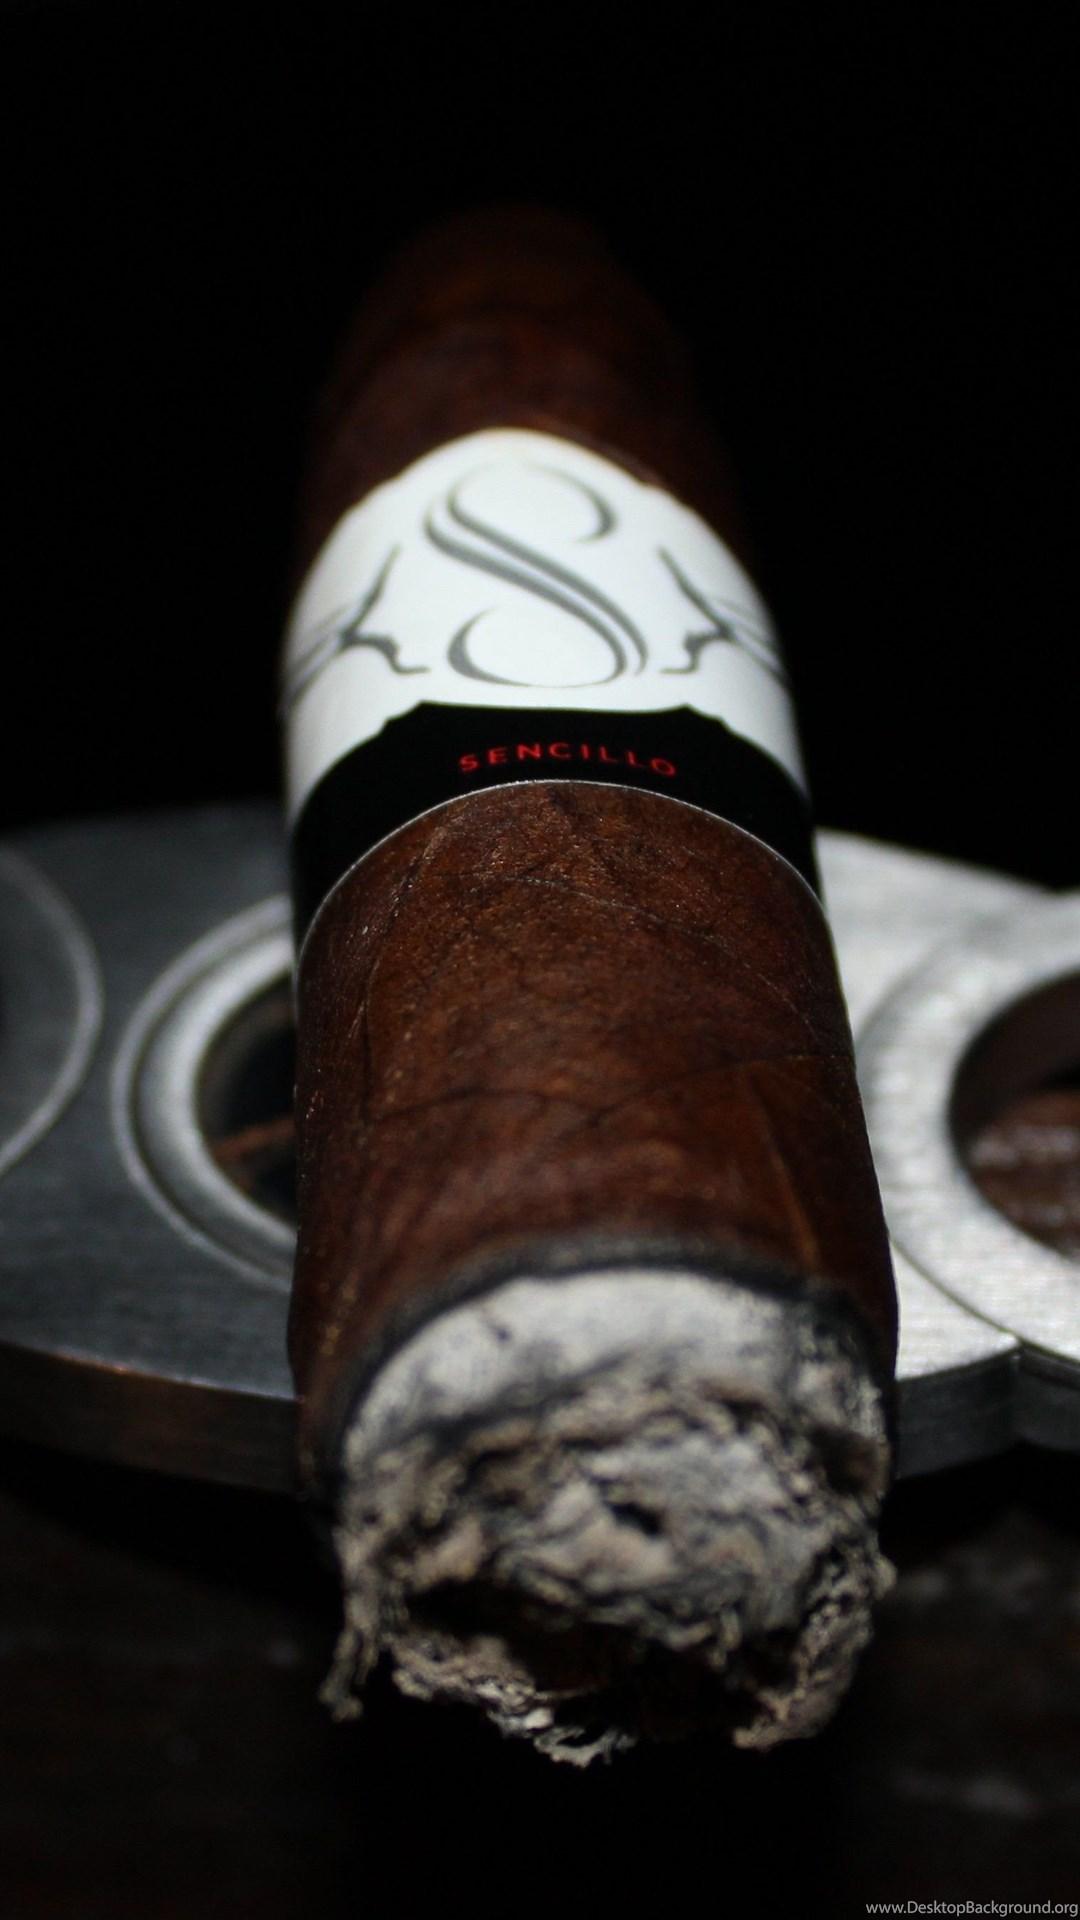 Cigars Cigarette Tobacco Bokeh Smoke Smoking Cigar